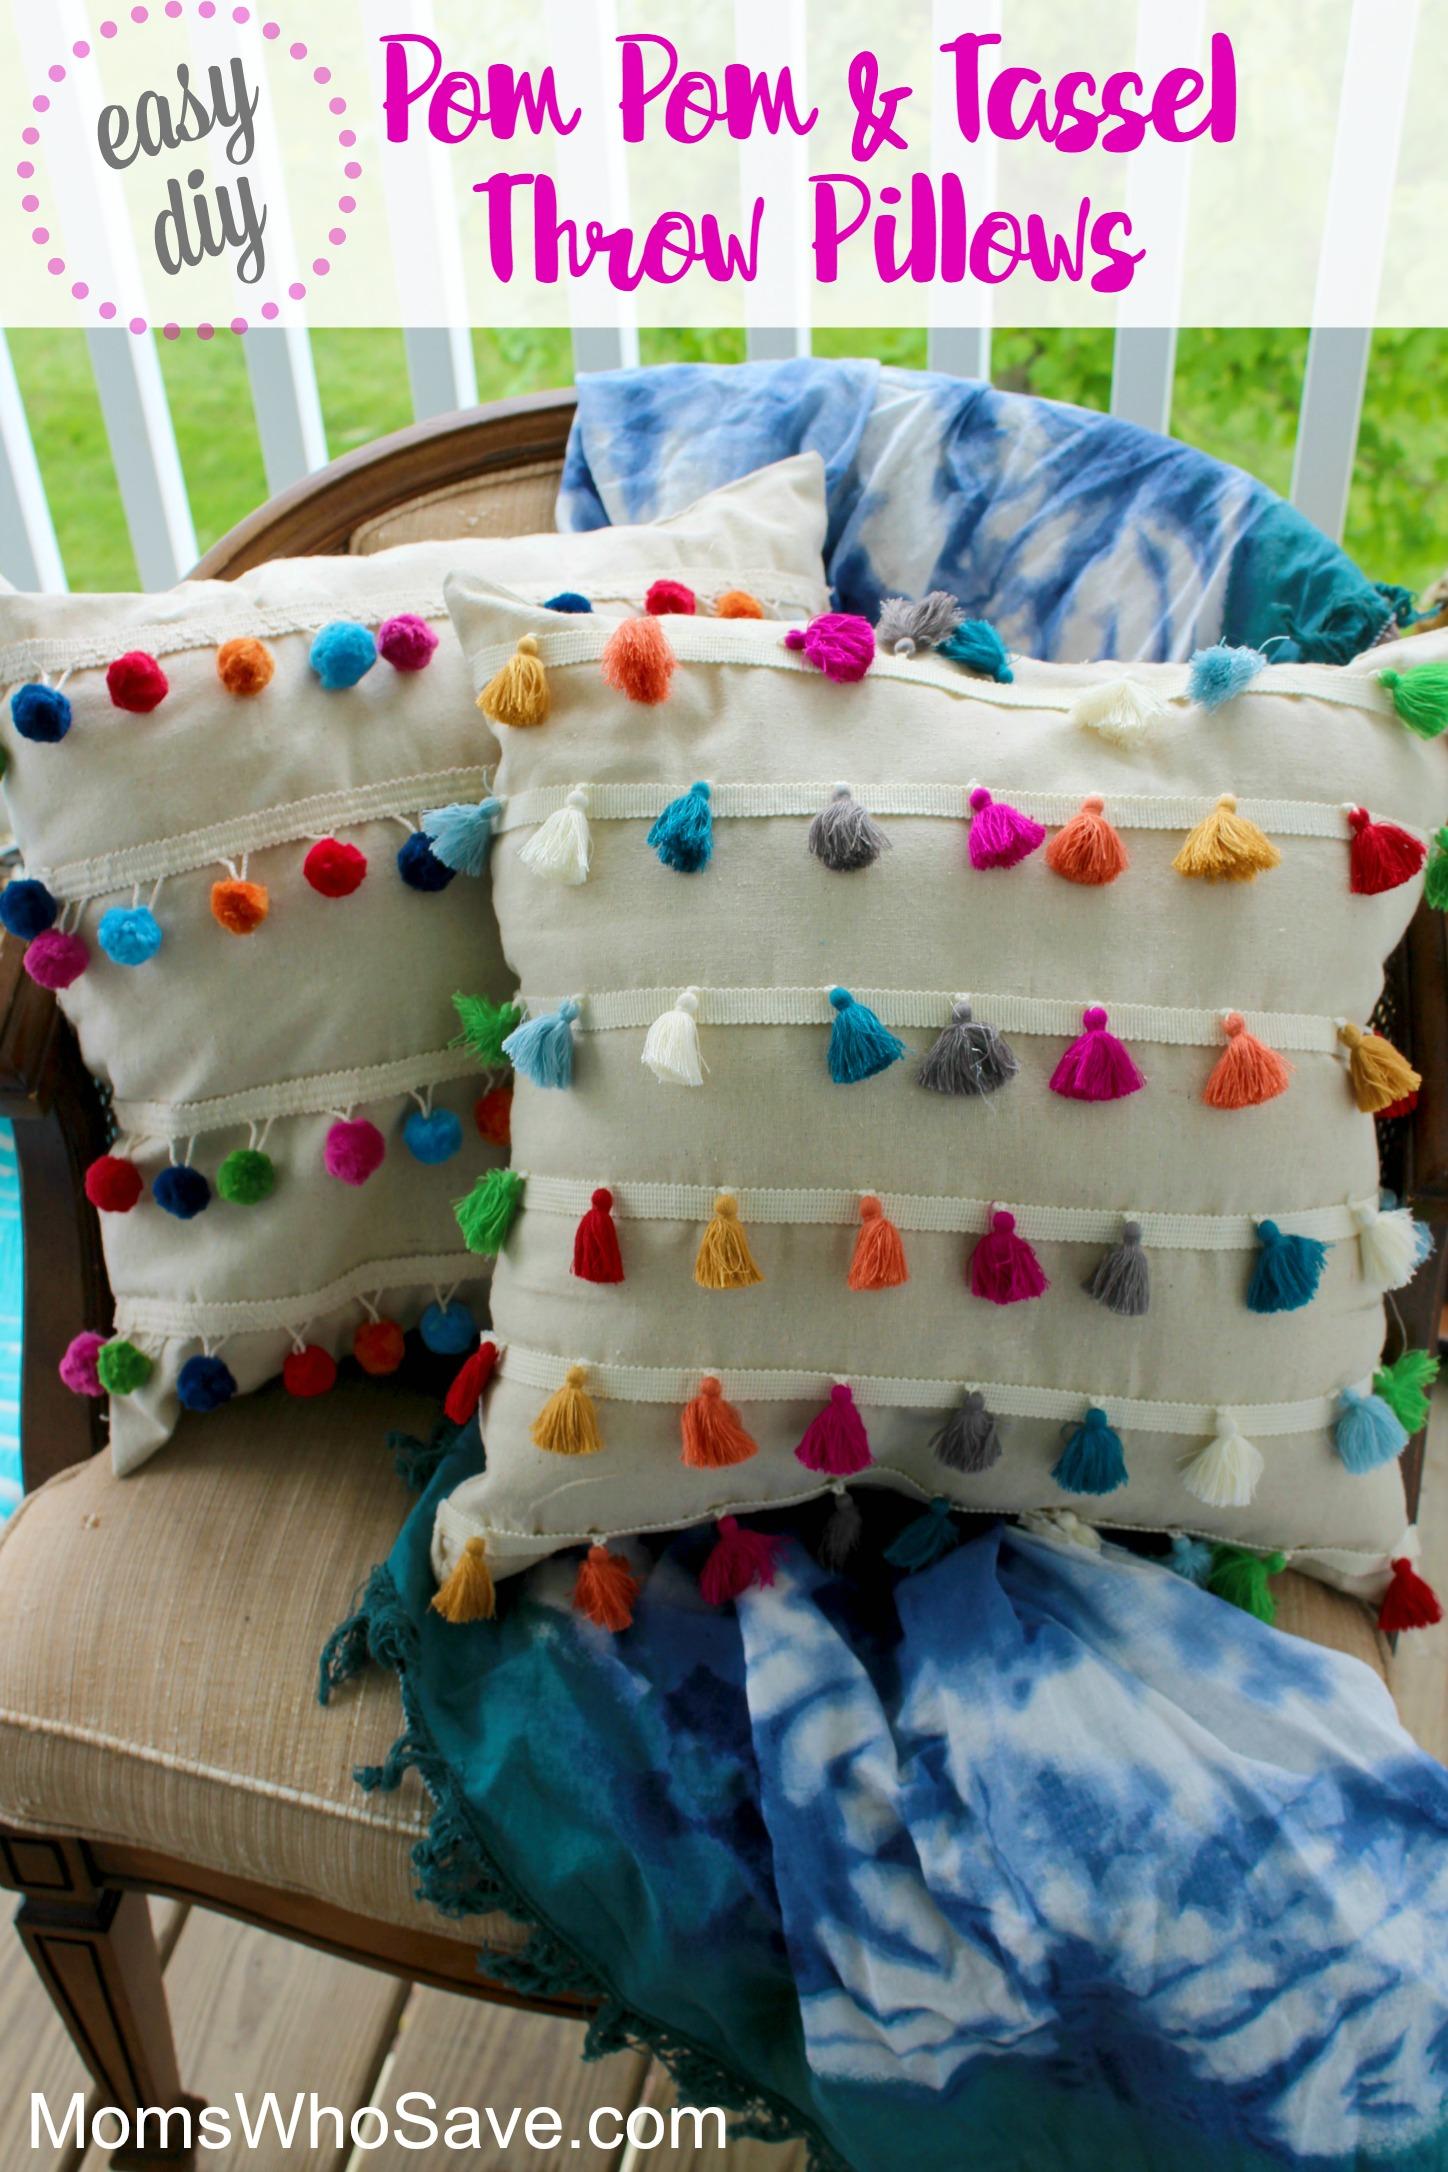 DIY Pom Pom and Tassel Throw Pillows